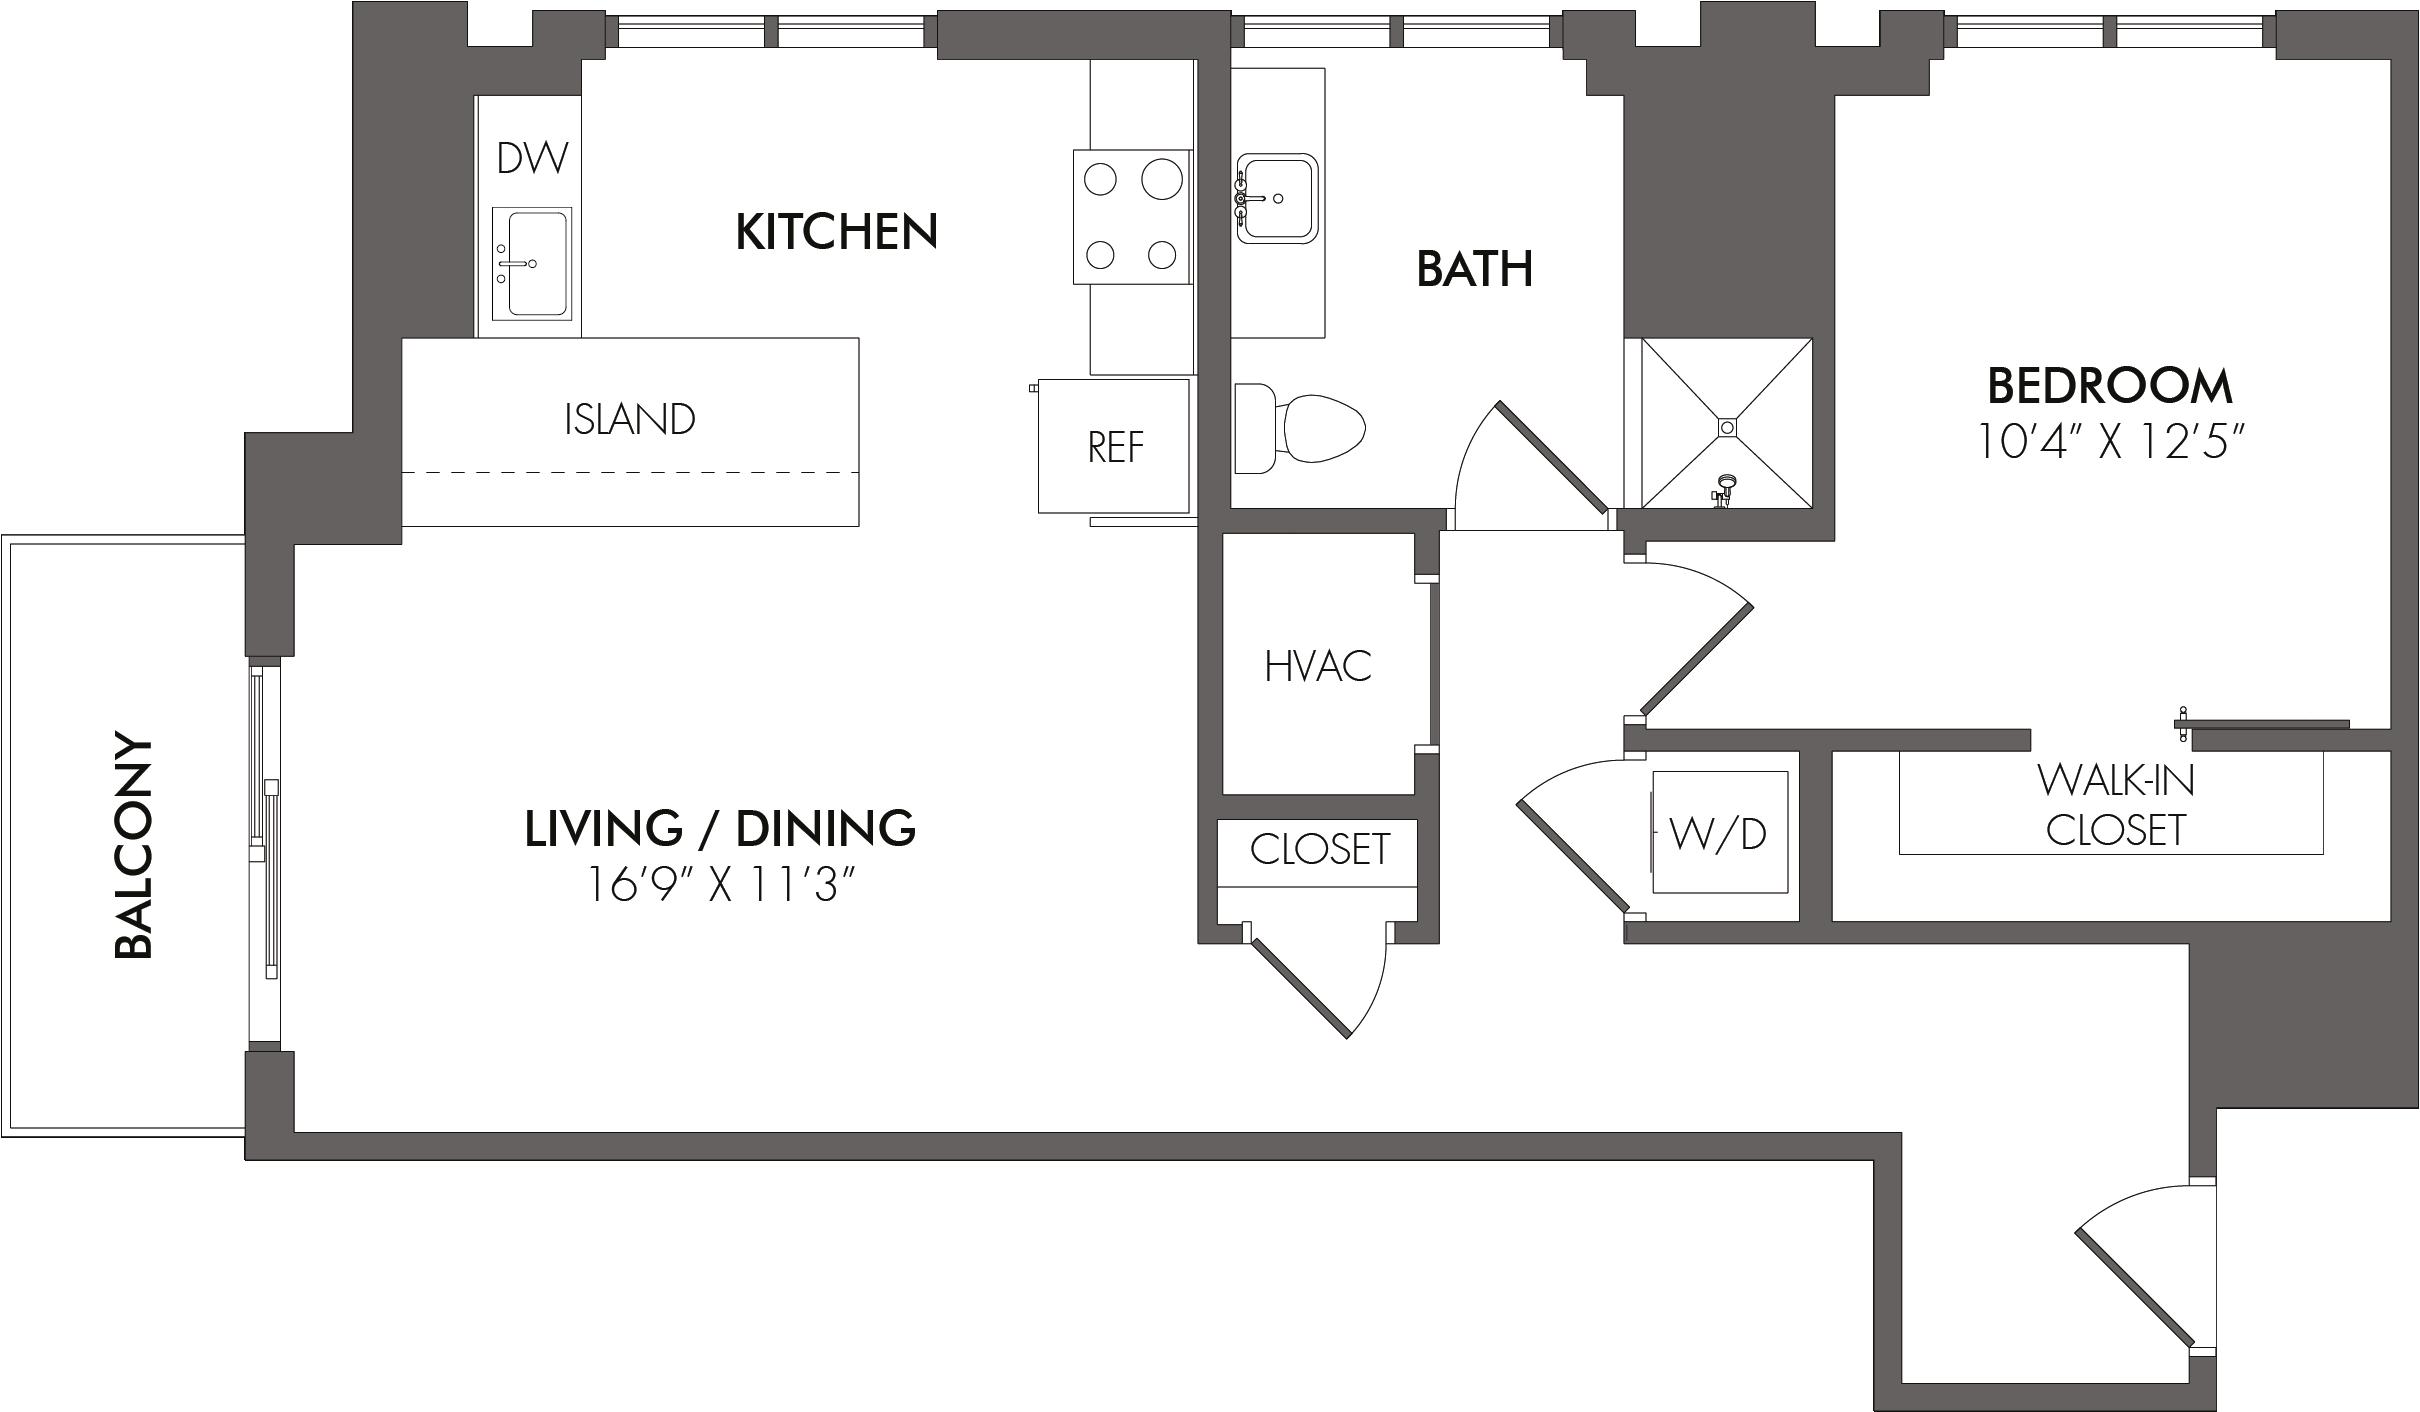 Apartment 2811 floorplan